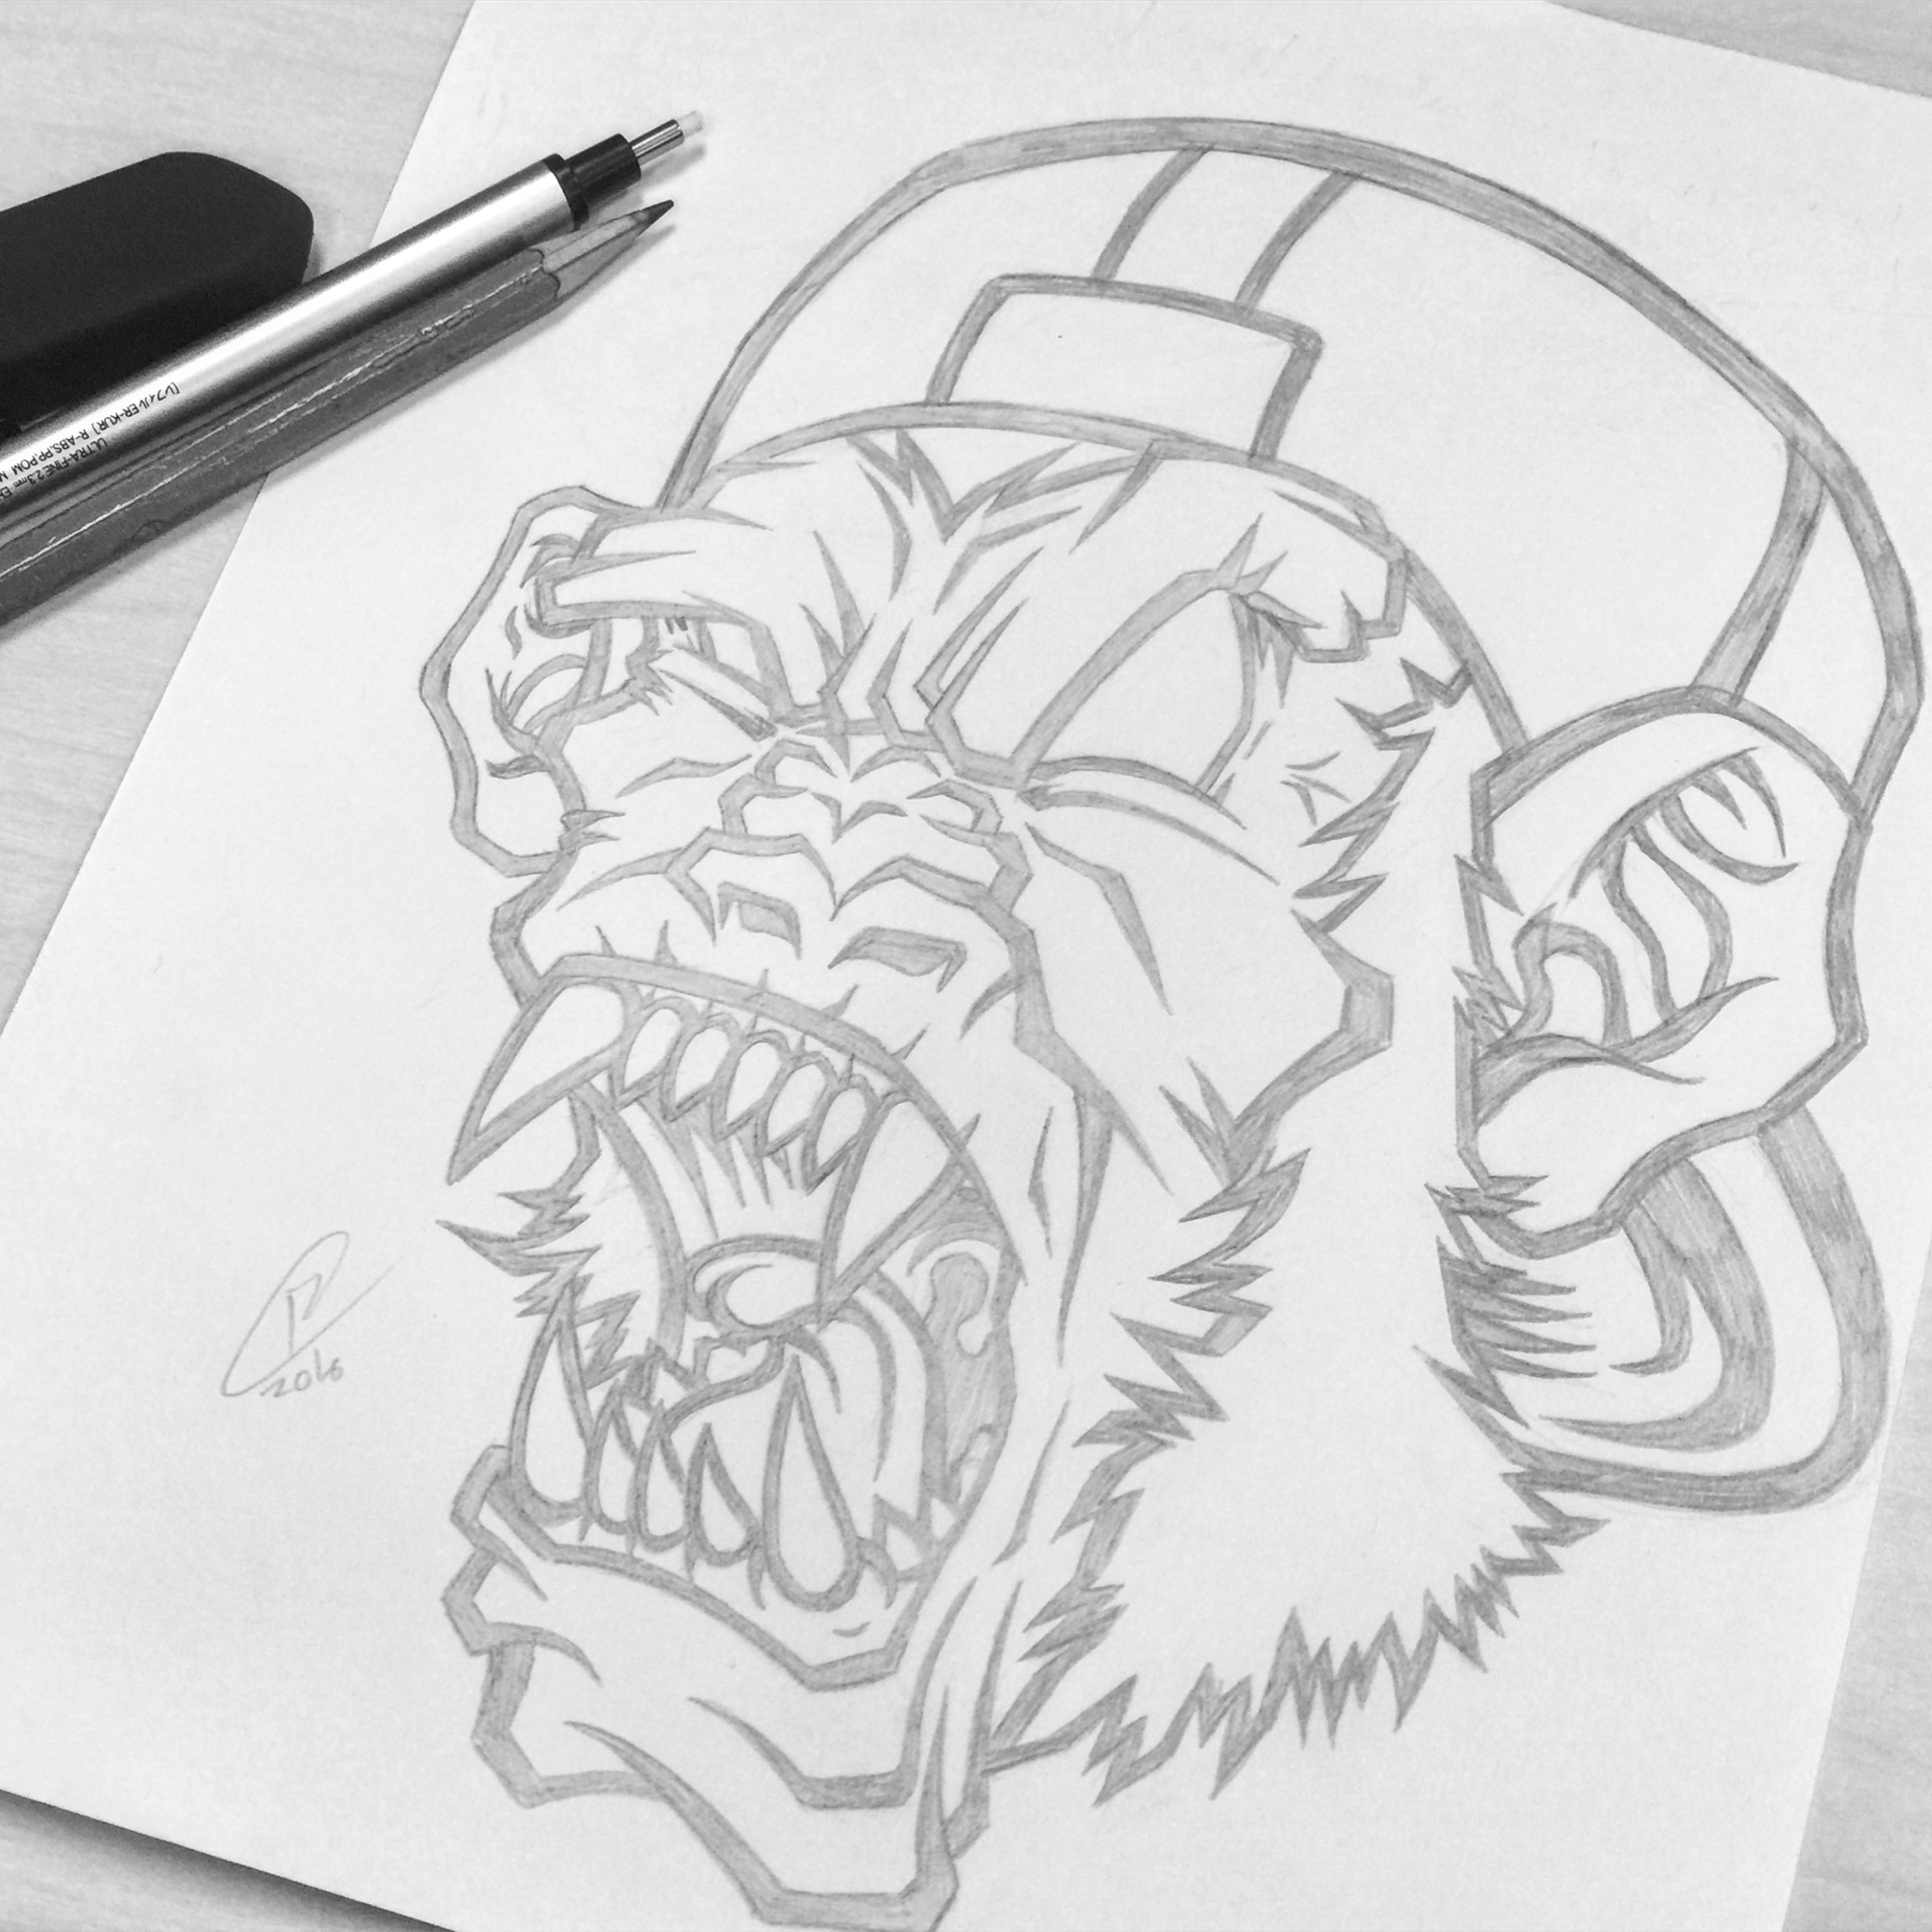 ODS-orozcodesign-monkey-ape,chimp-illustration-vector-illustrator-artist-roberto-orozco-digital-design-sketch.jpg